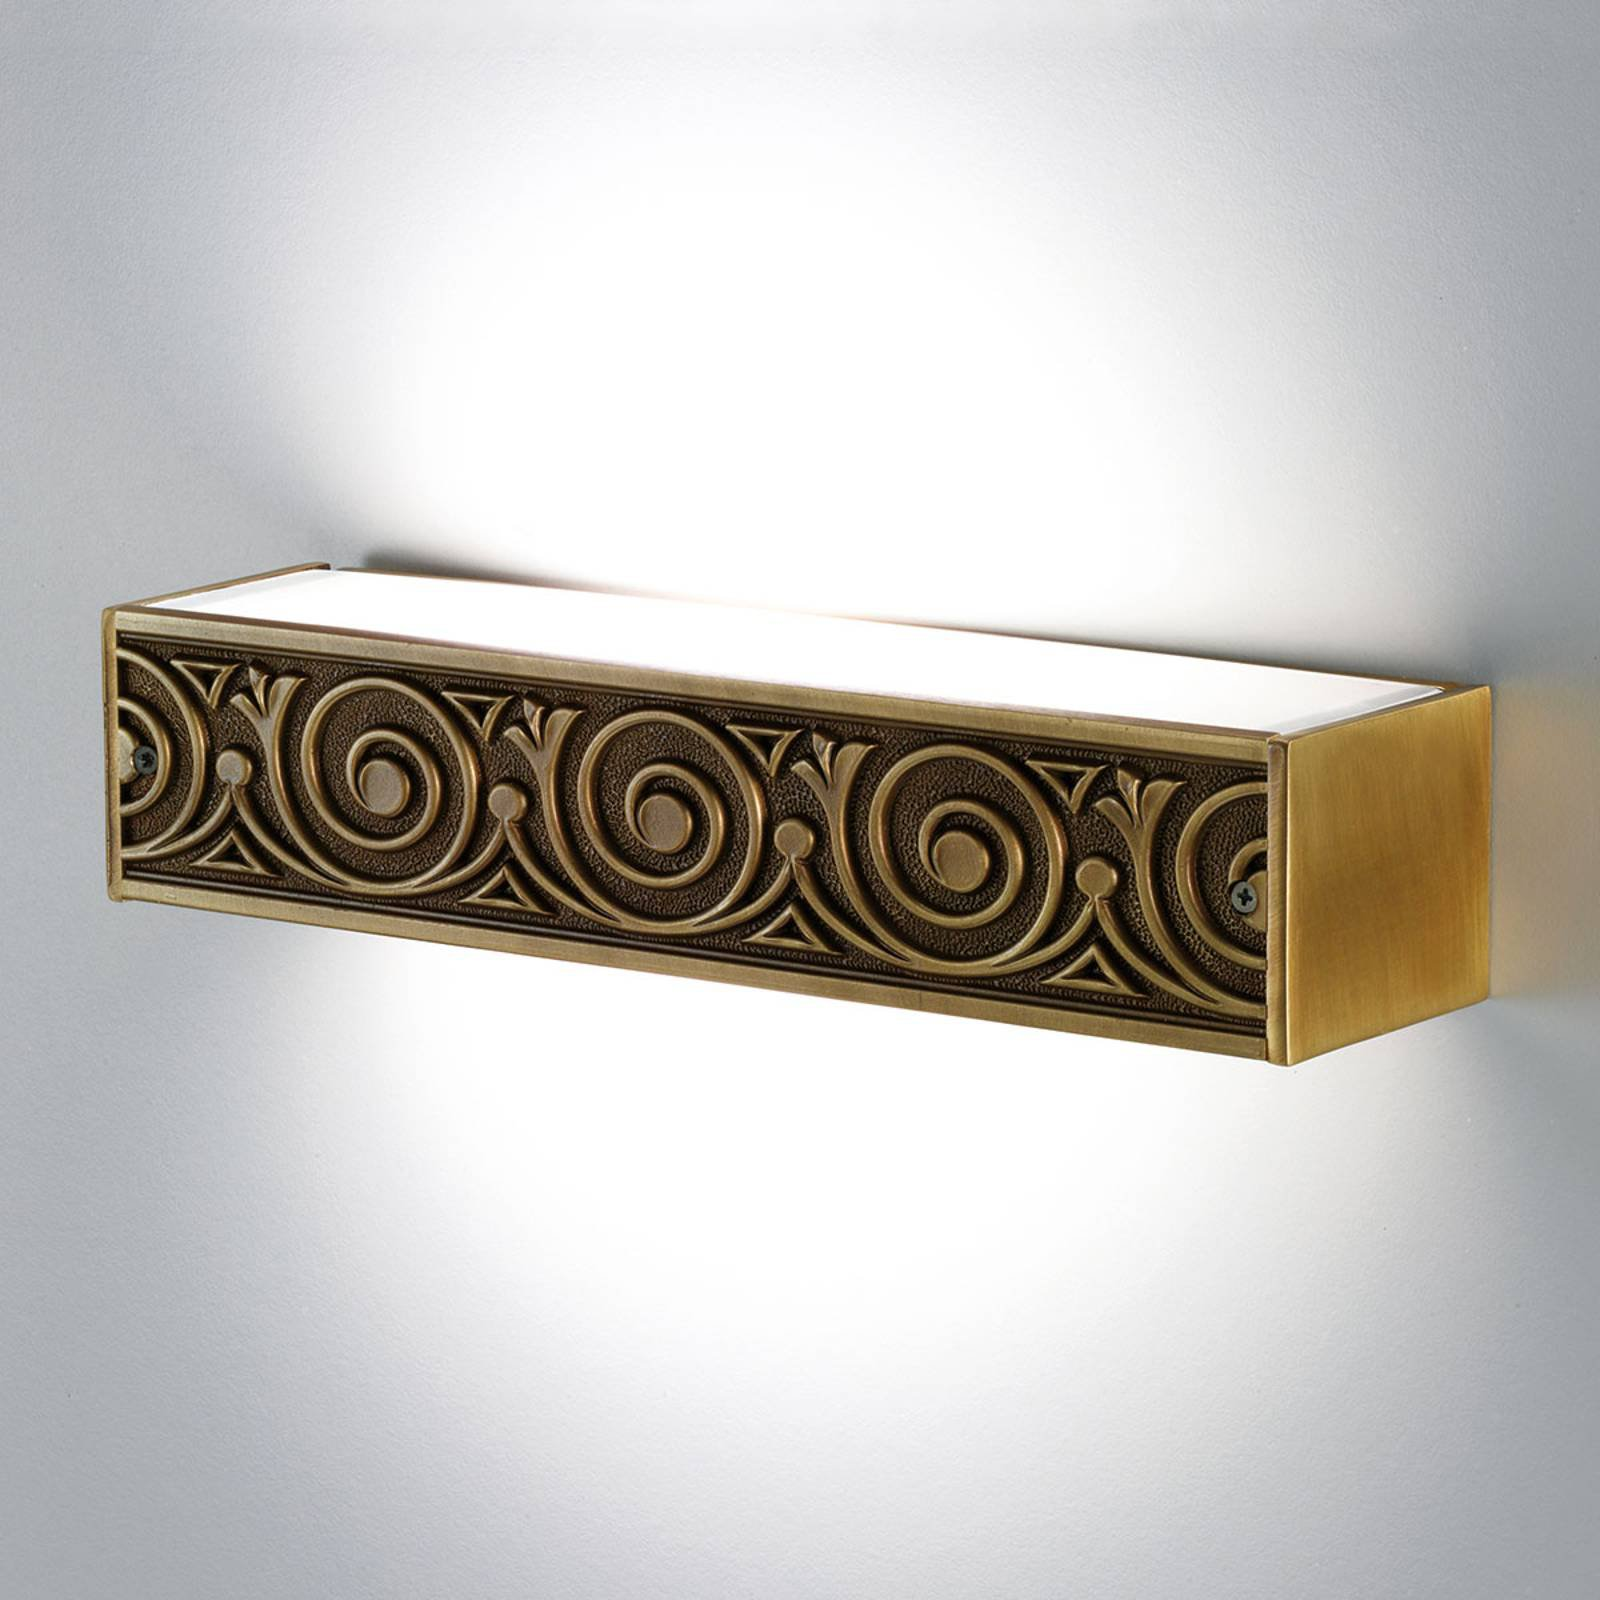 Greca vegglampe med eksklusiv dekor